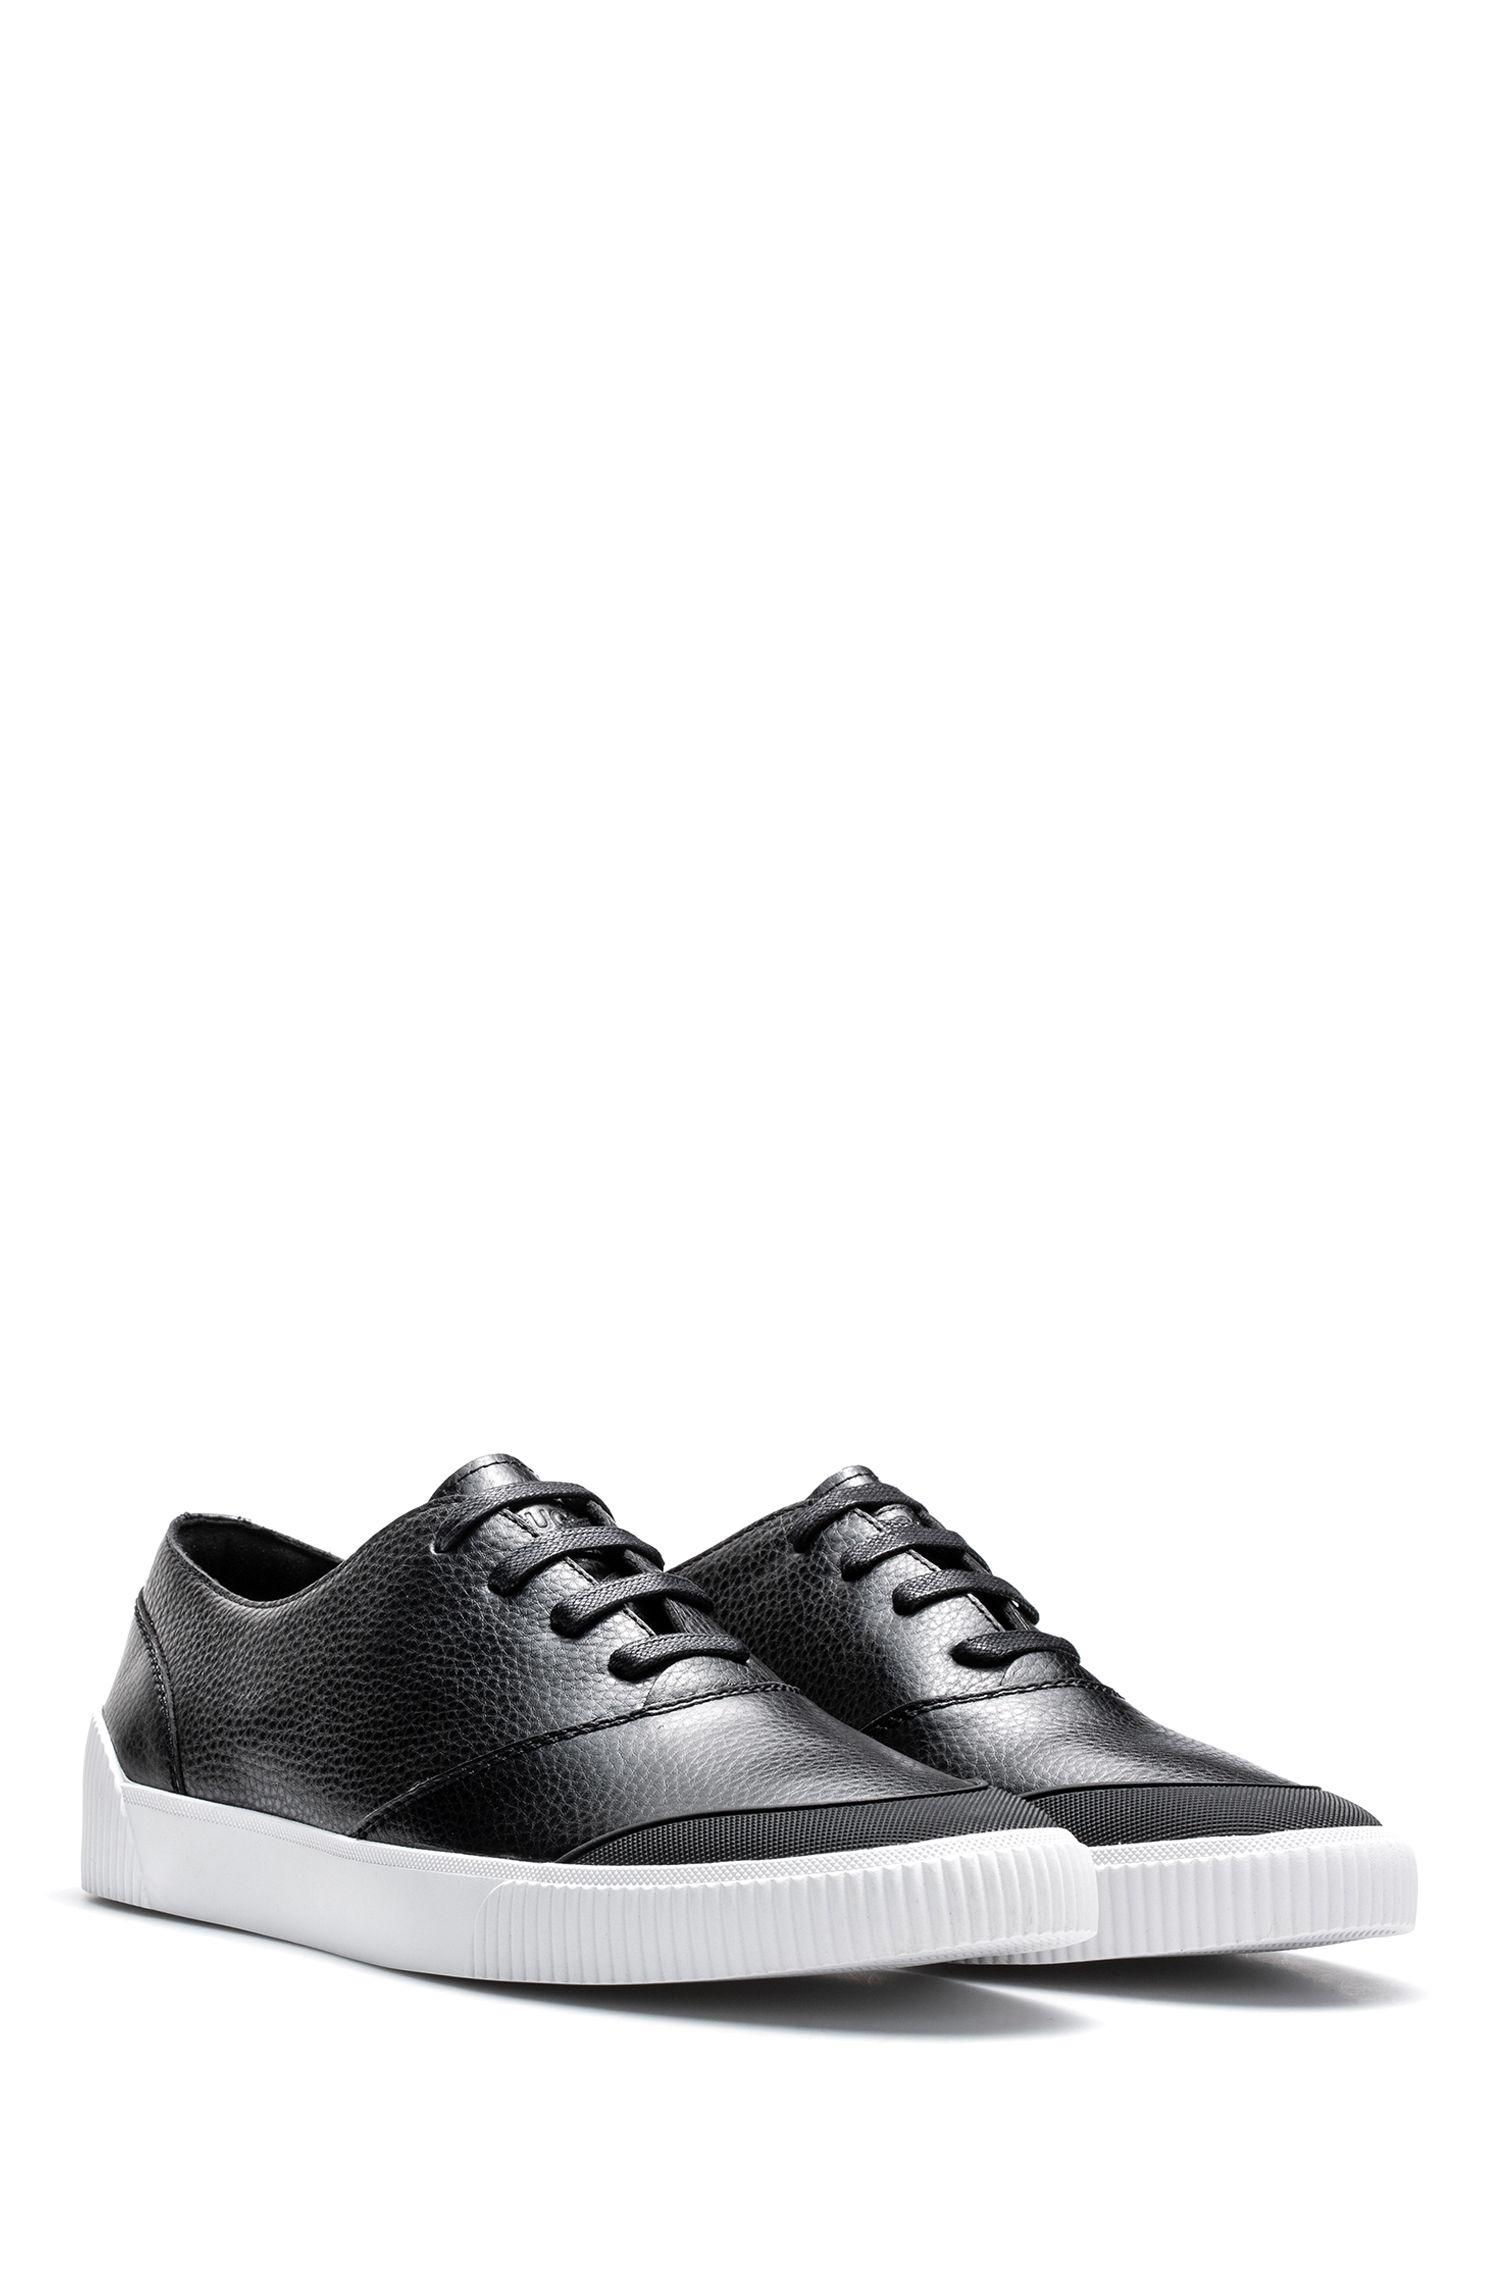 Sneakers aus gewalktem Leder